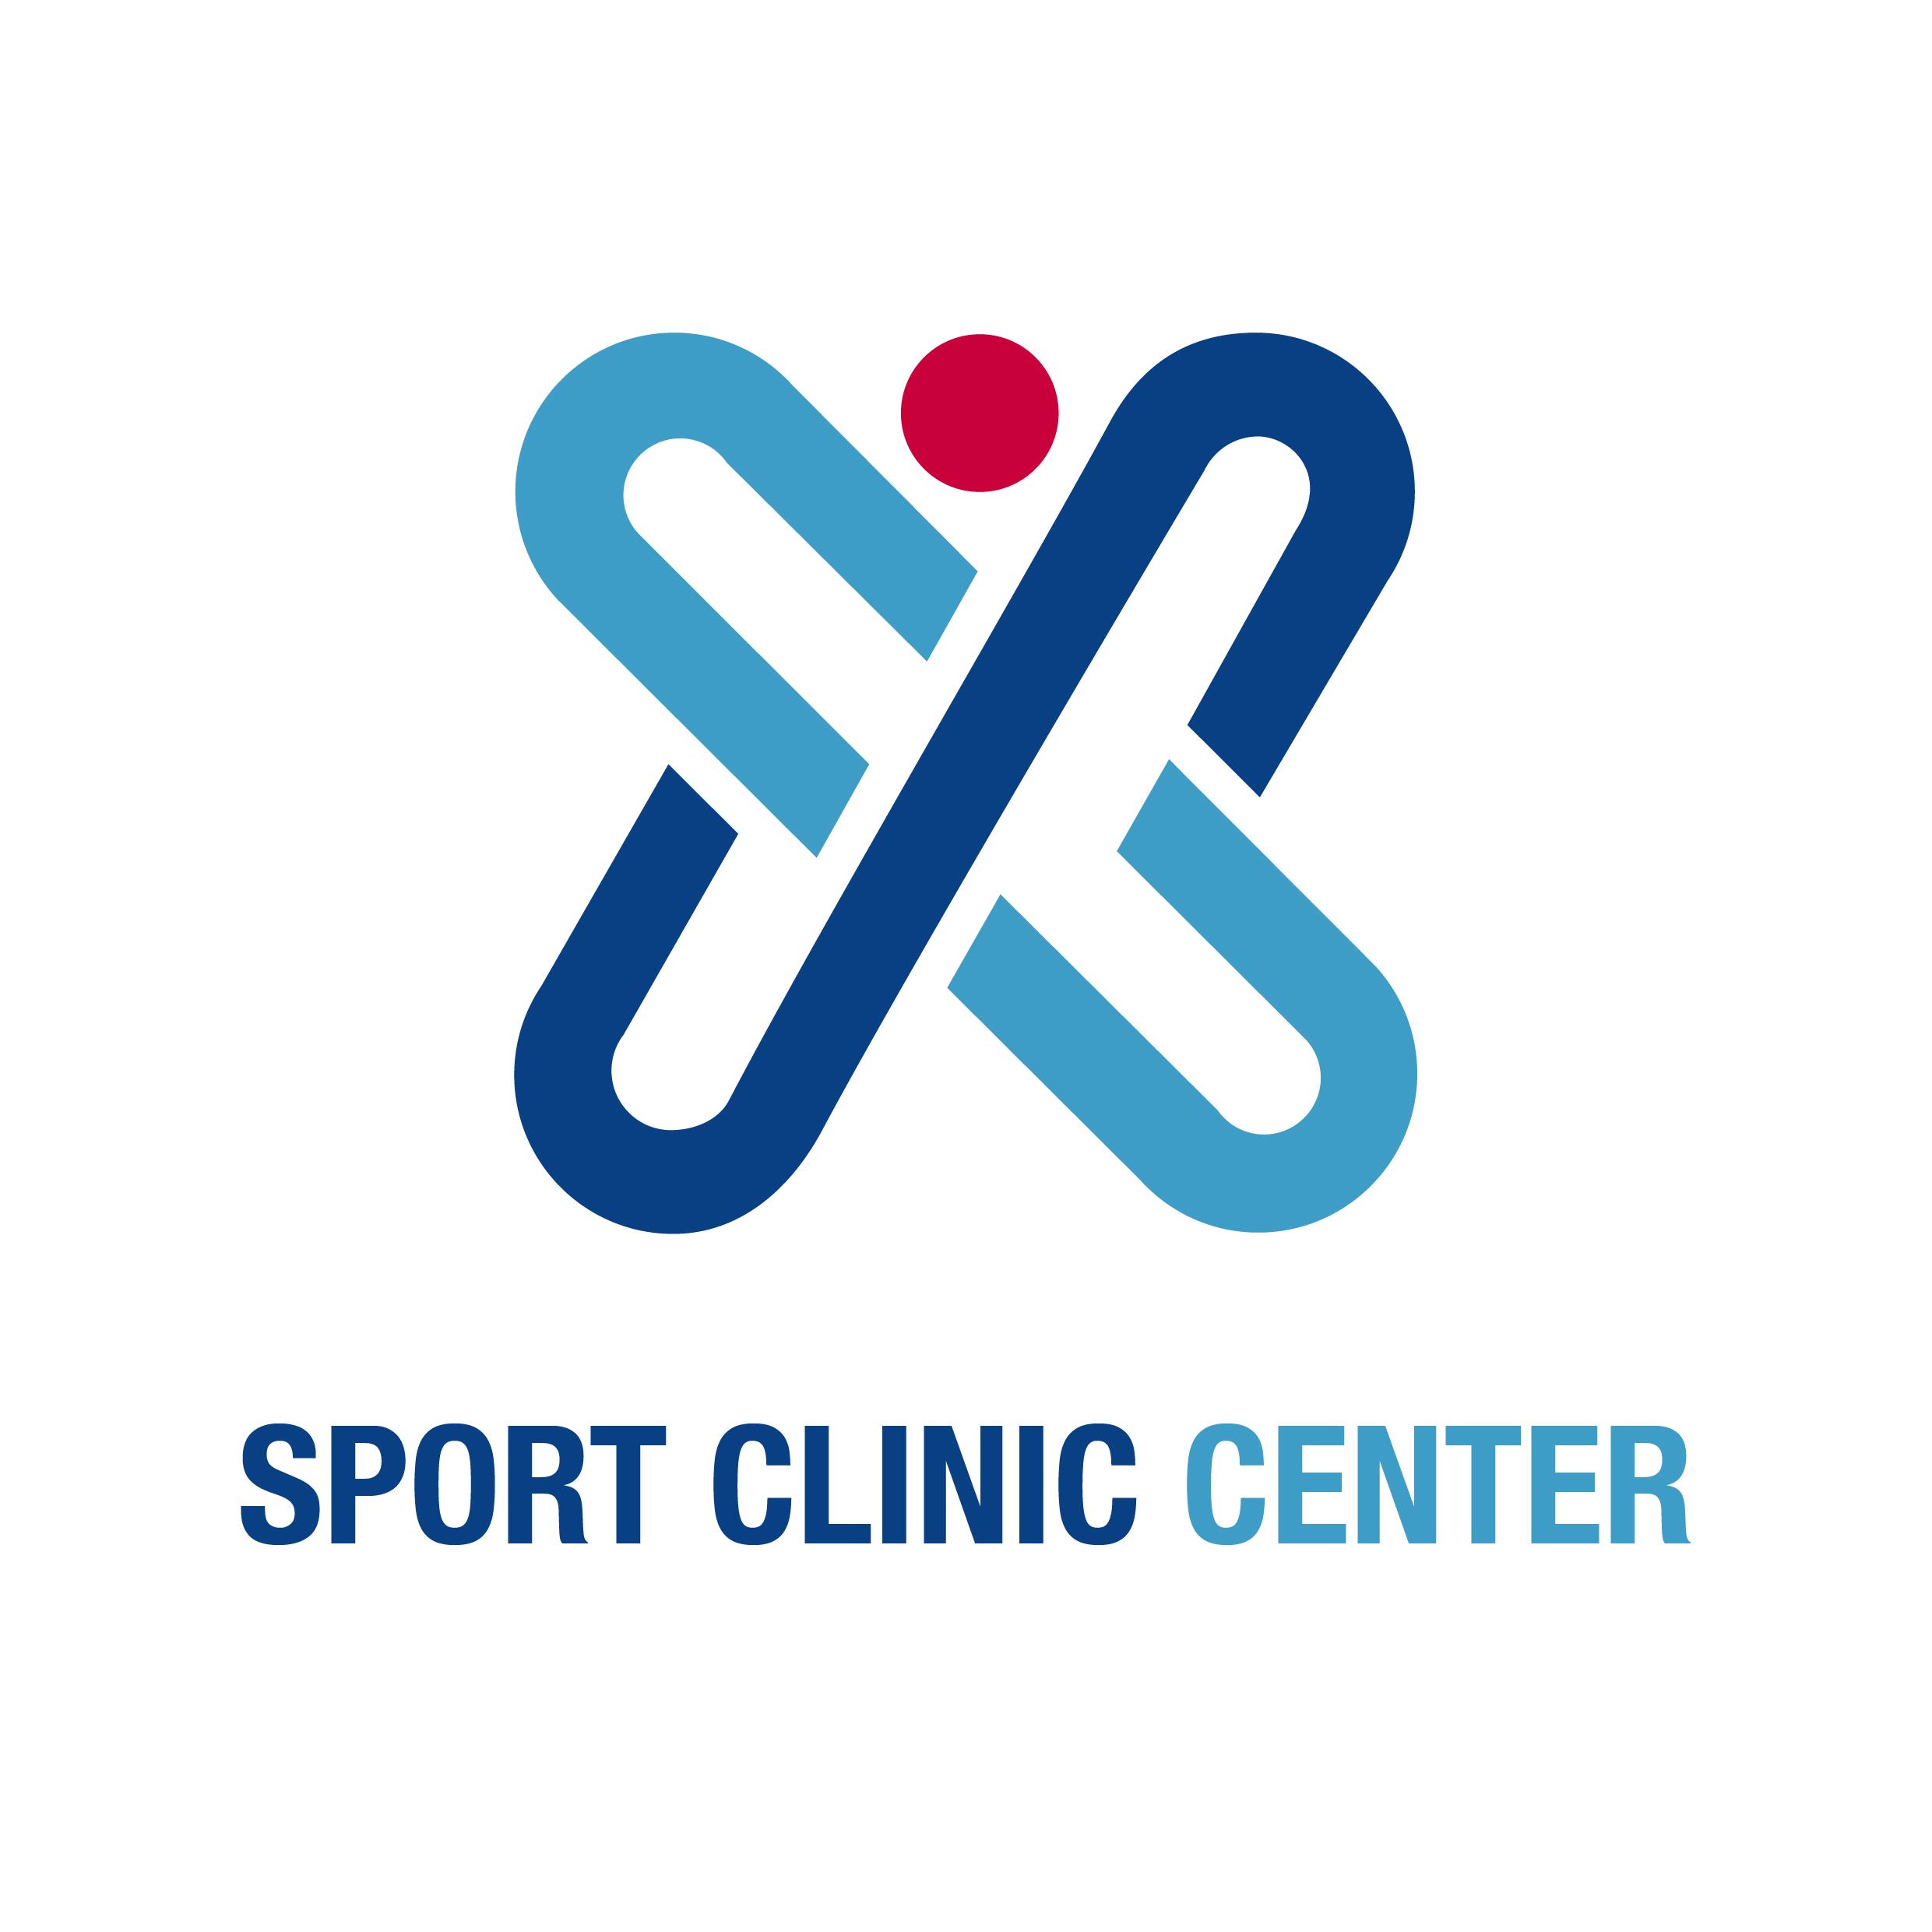 Sport Clinic Center srl